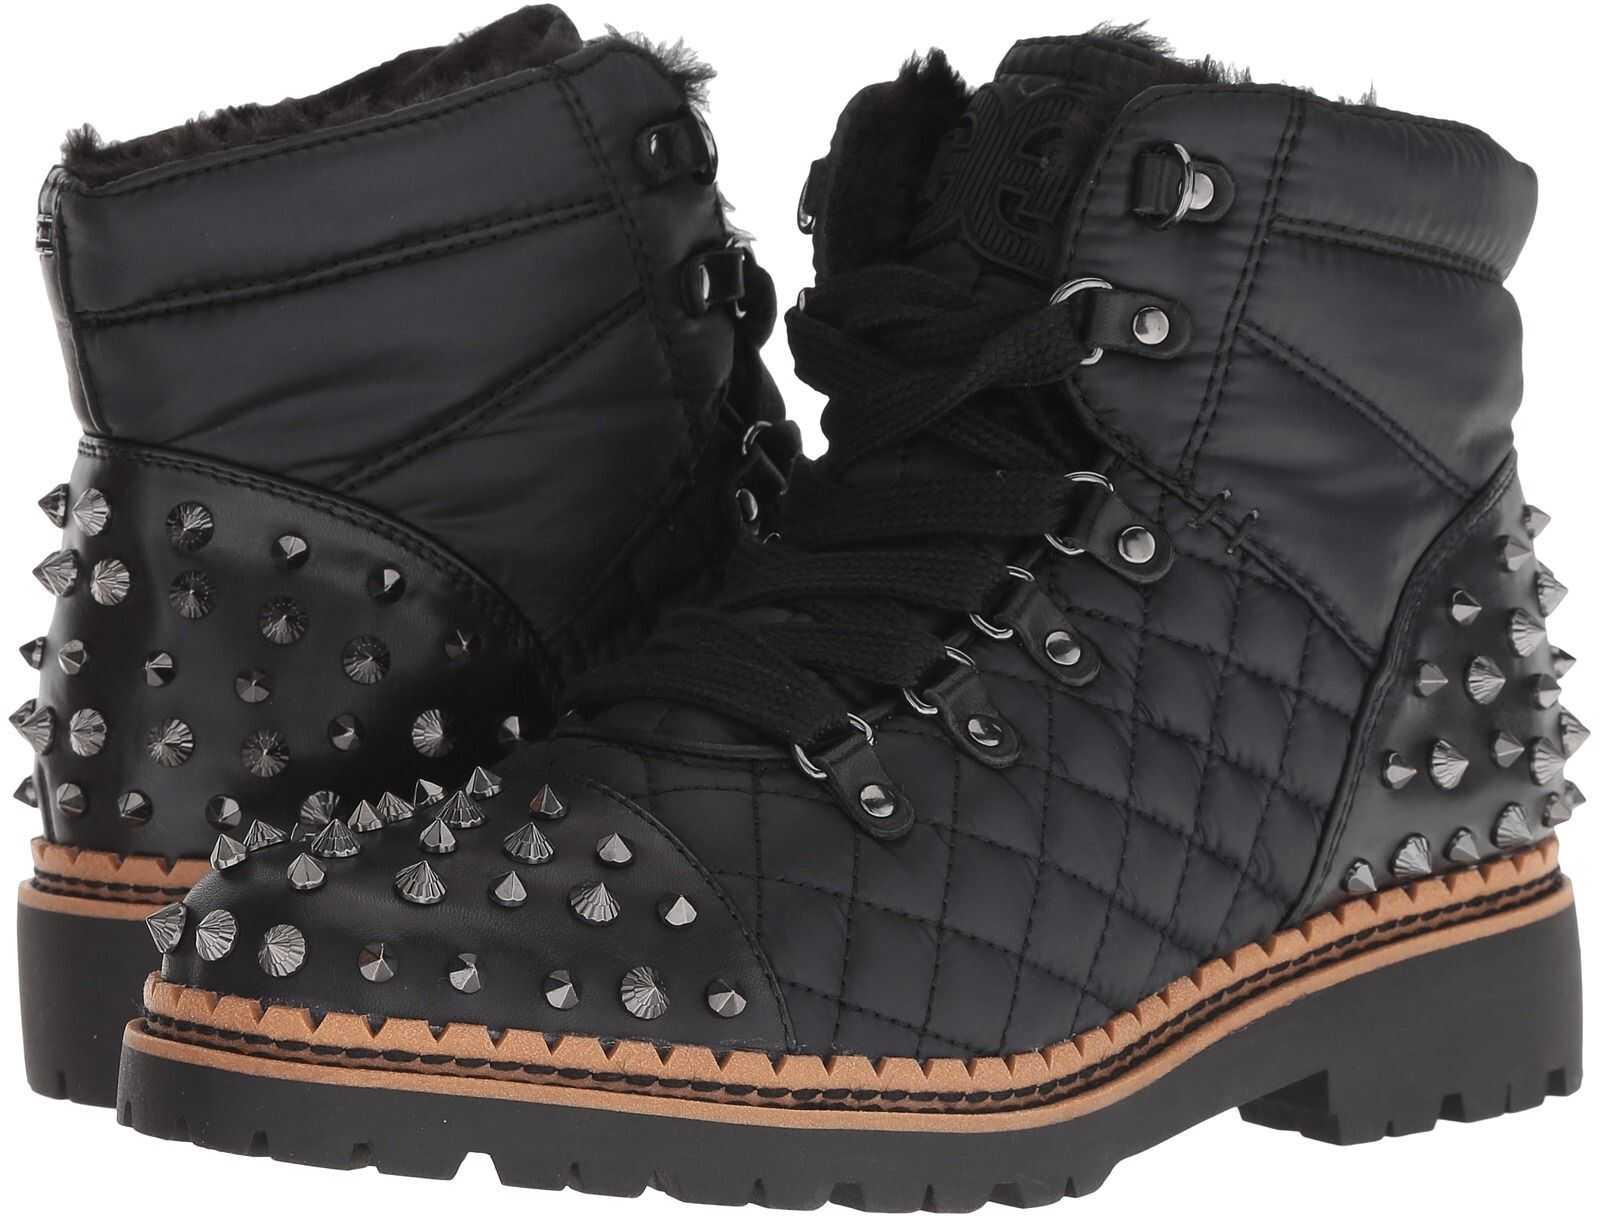 Sam Edelman Bren Black Leather High Shine Nylon/Modena Calf Leather